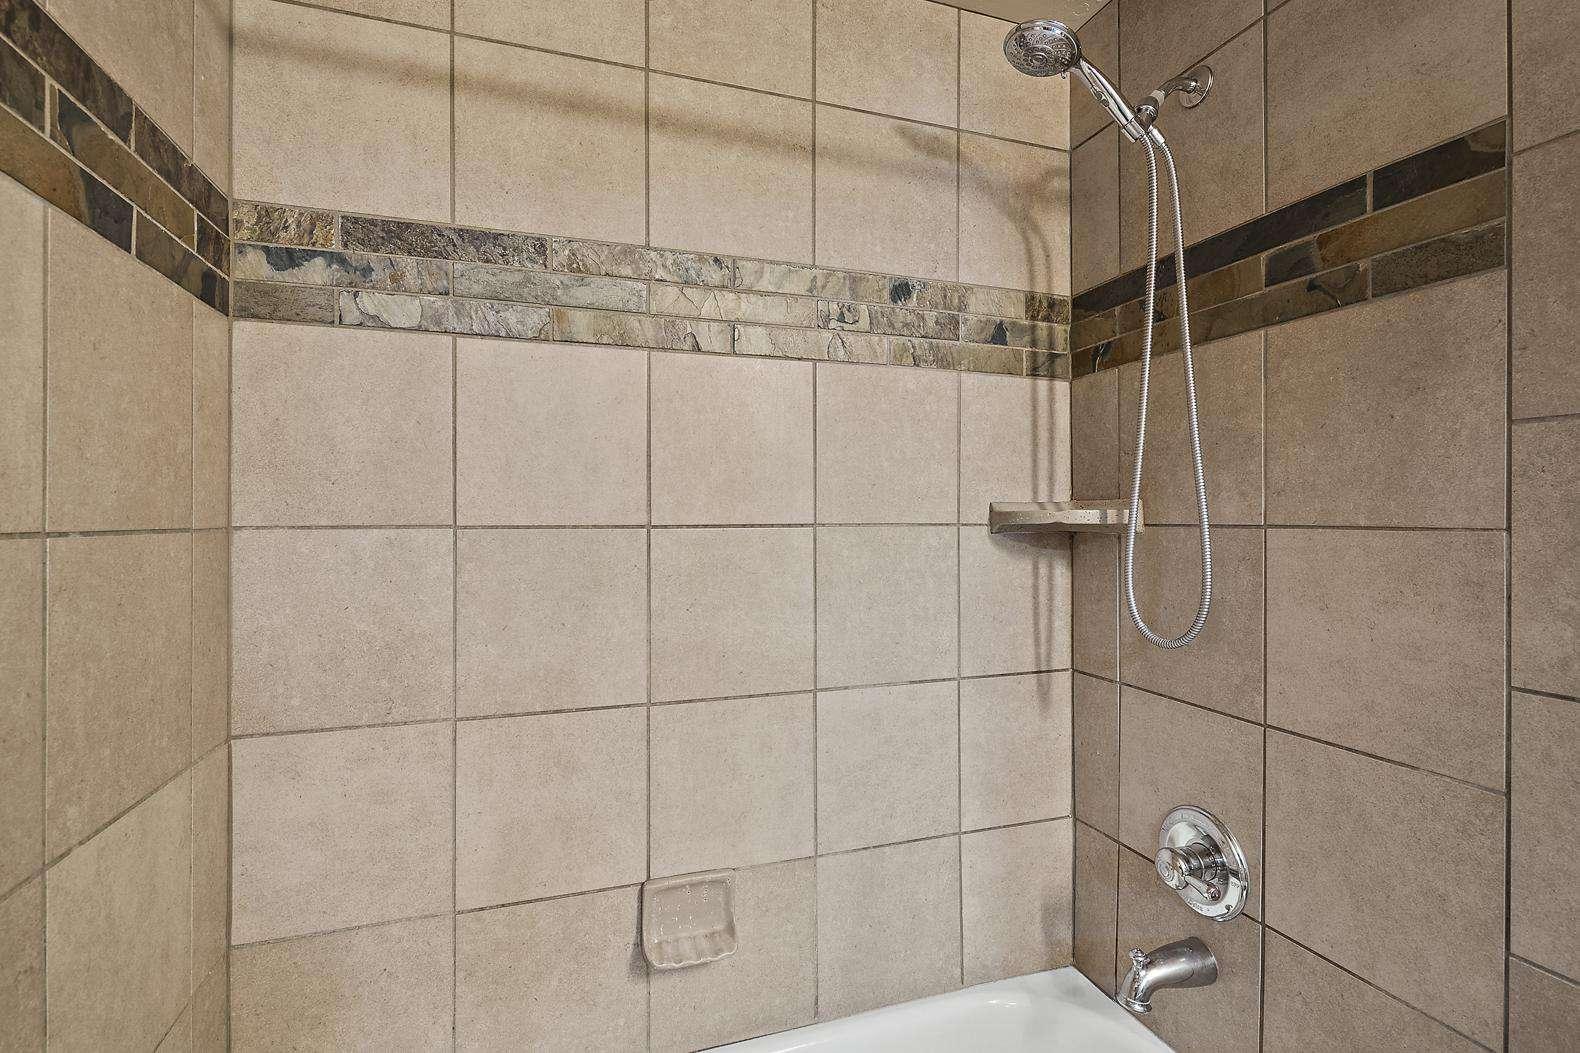 Guest bathroom tub/shower combo